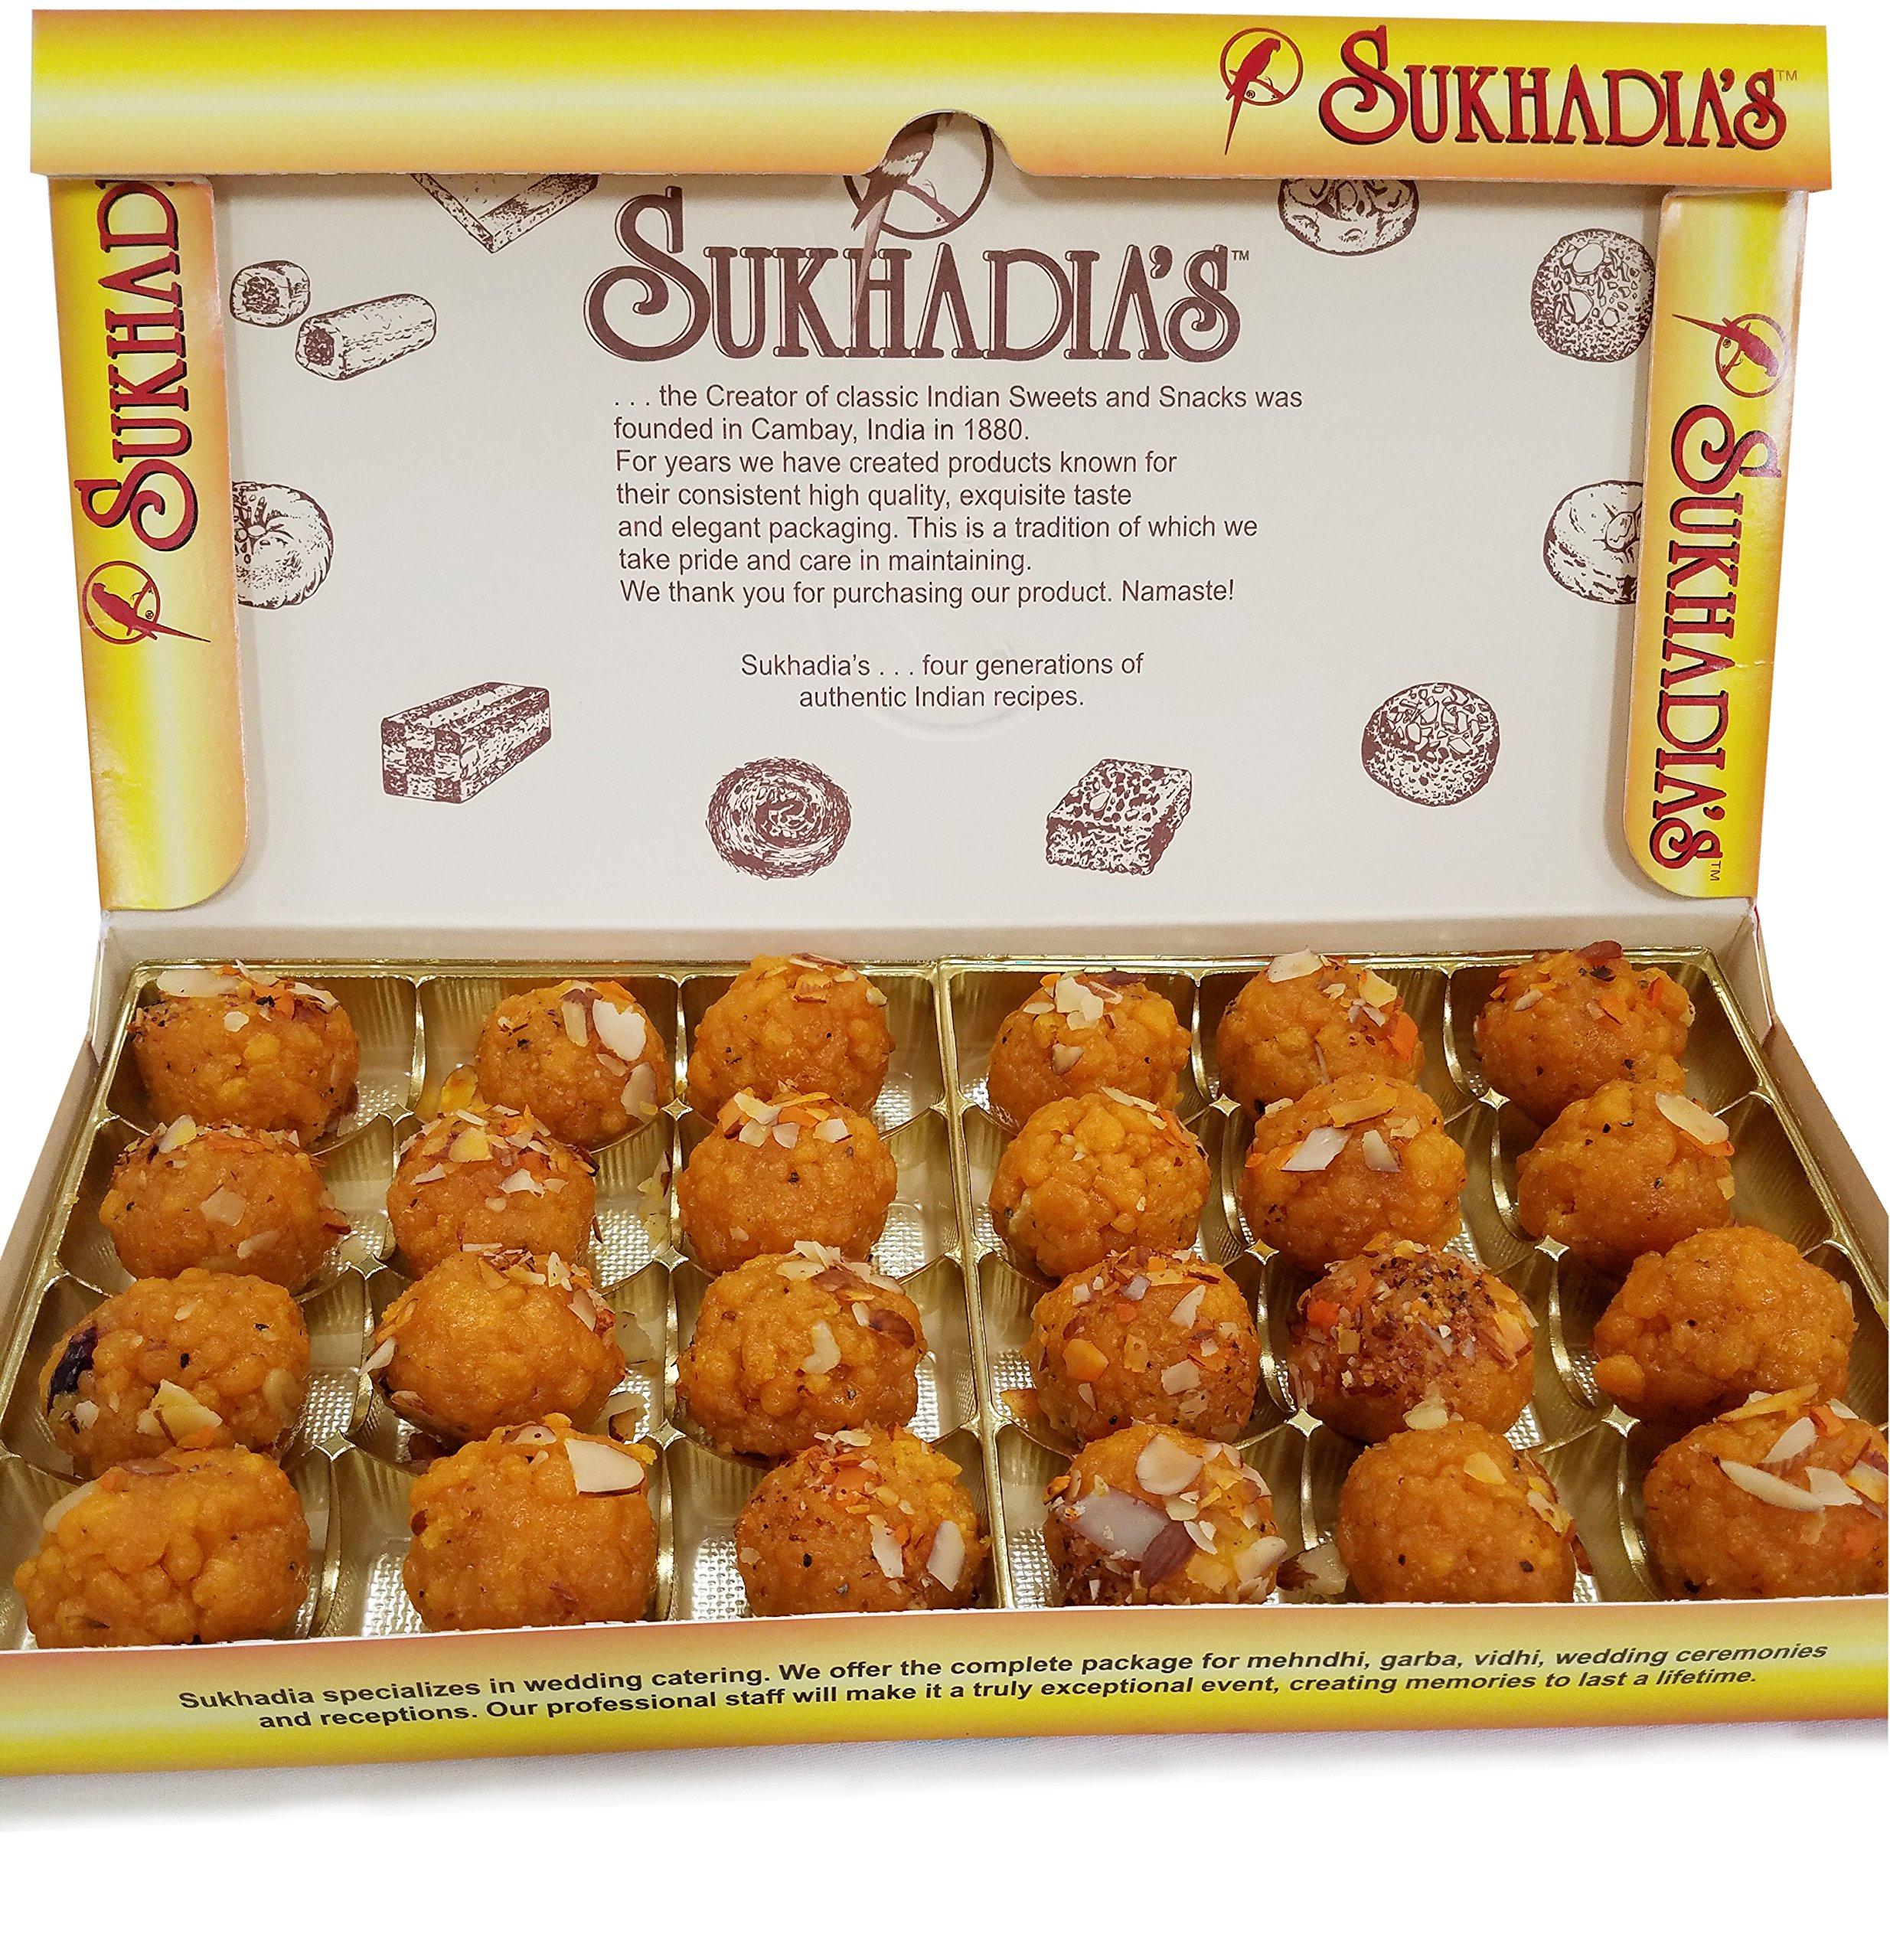 Sukhadia's Boondi Ladoo Indian Sweet, 2LB Box (32oz) by Sukhadia's